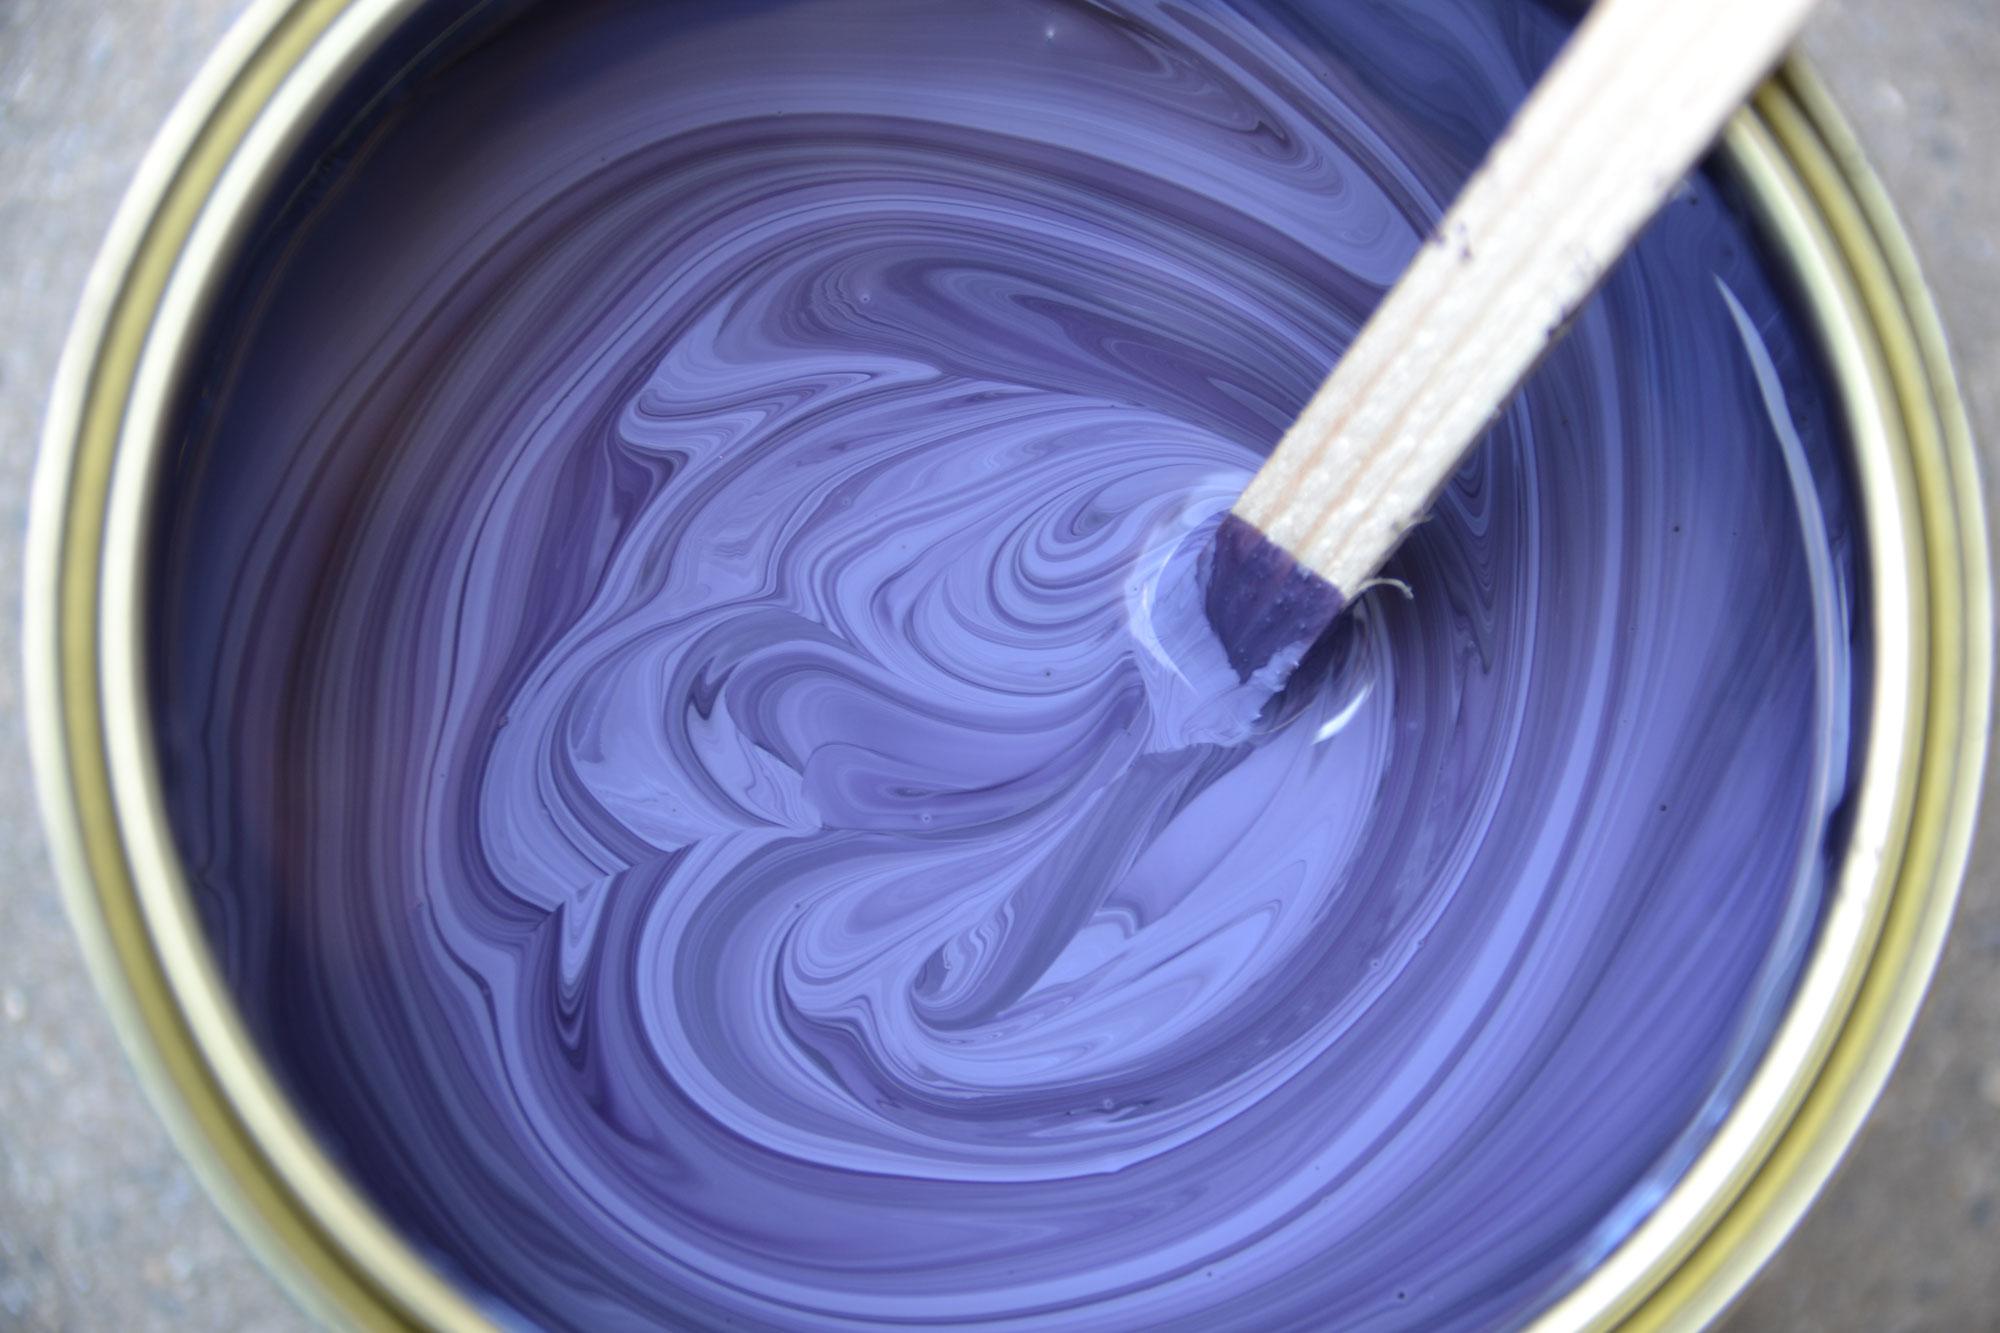 Lein lfarbe painting the past kreidefarbe und - Farbtafeln wandfarbe ...